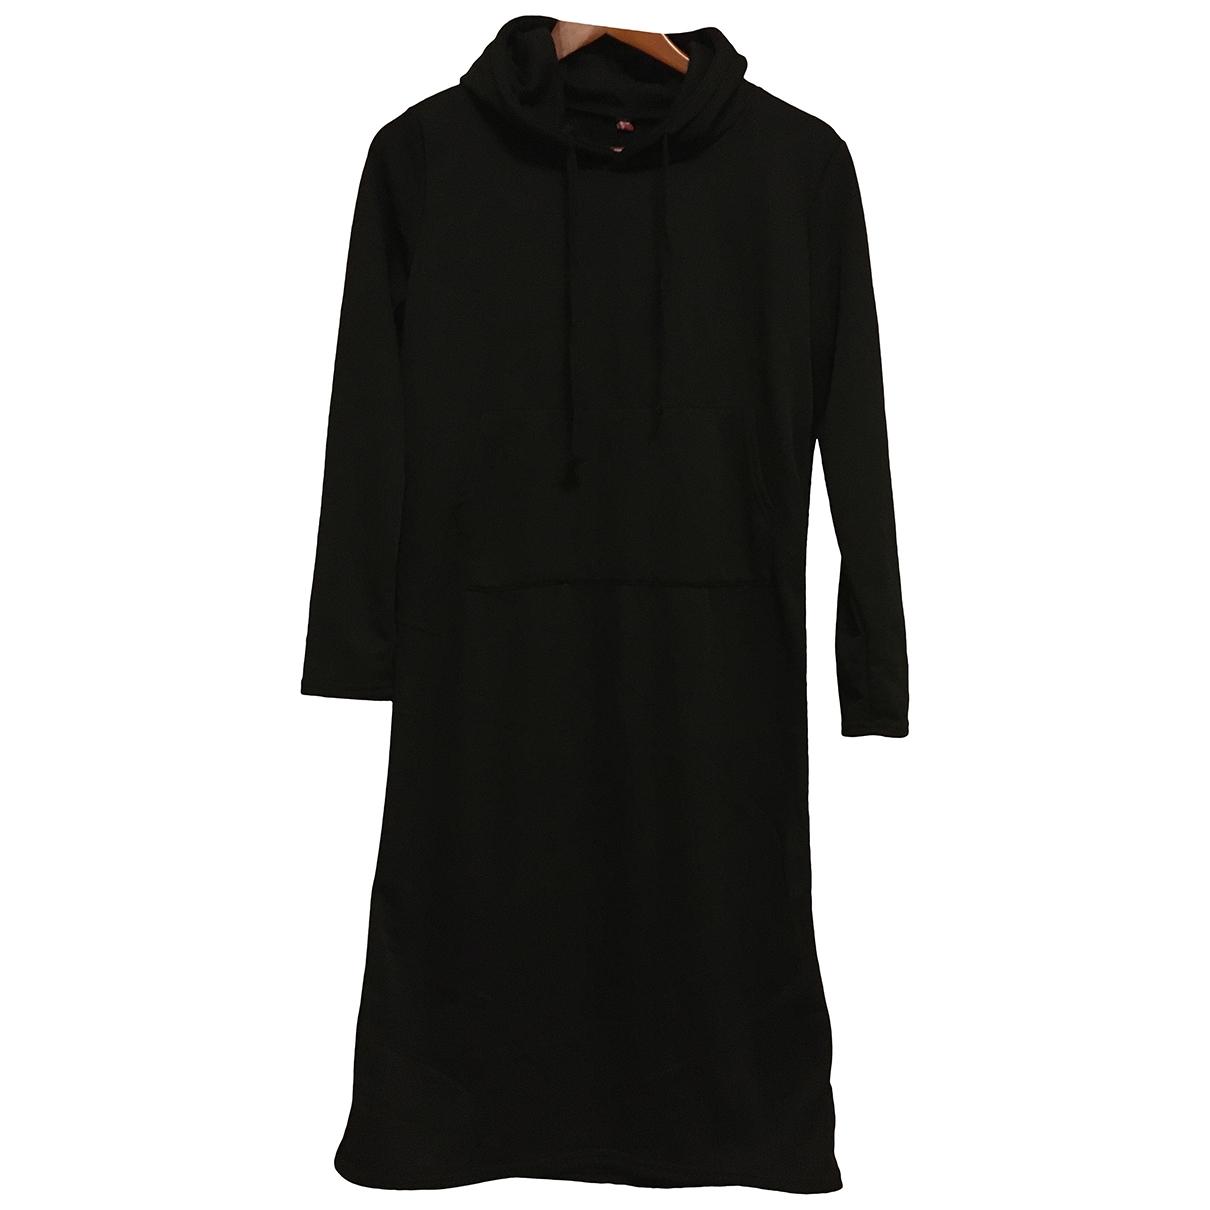 Saks Fifth Avenue Collection \N Kleid in  Schwarz Synthetik